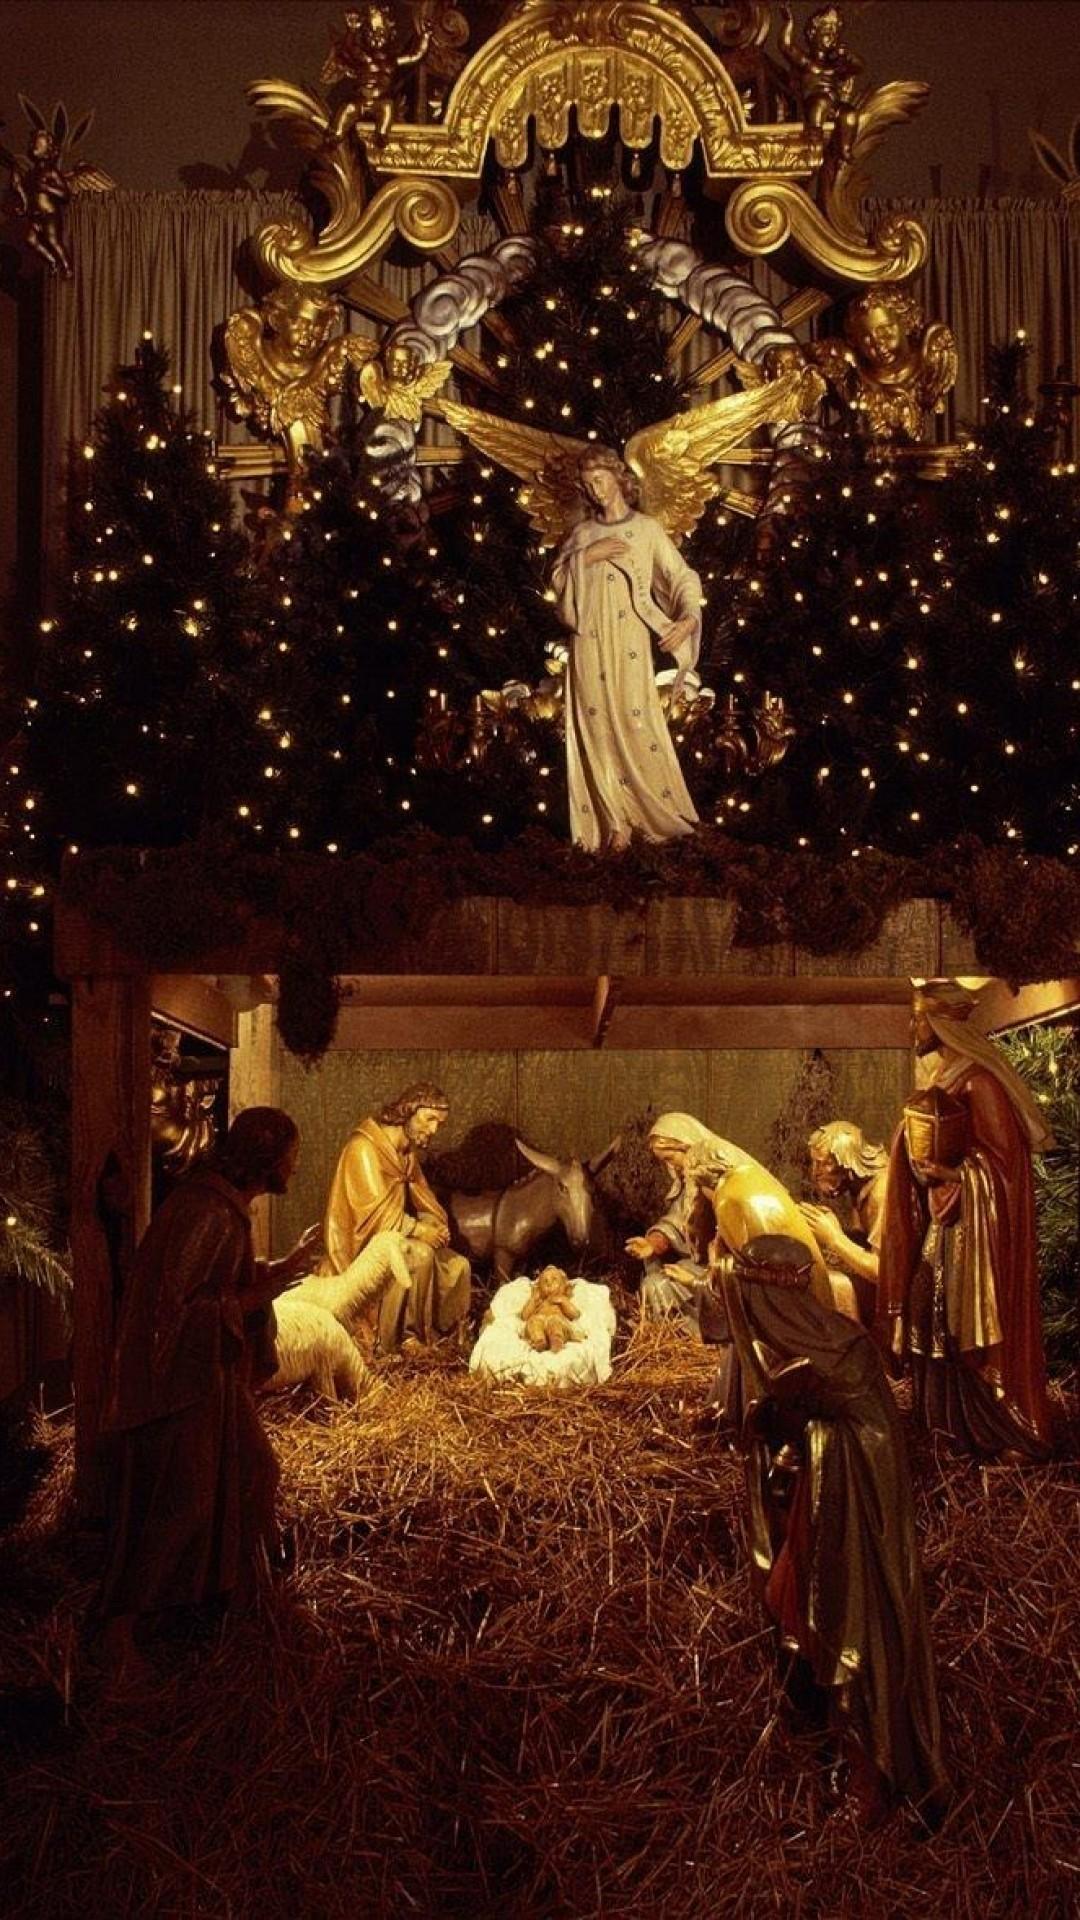 Wallpaper christmas, jesus, nurseries, christmas trees, garland,  holiday, people